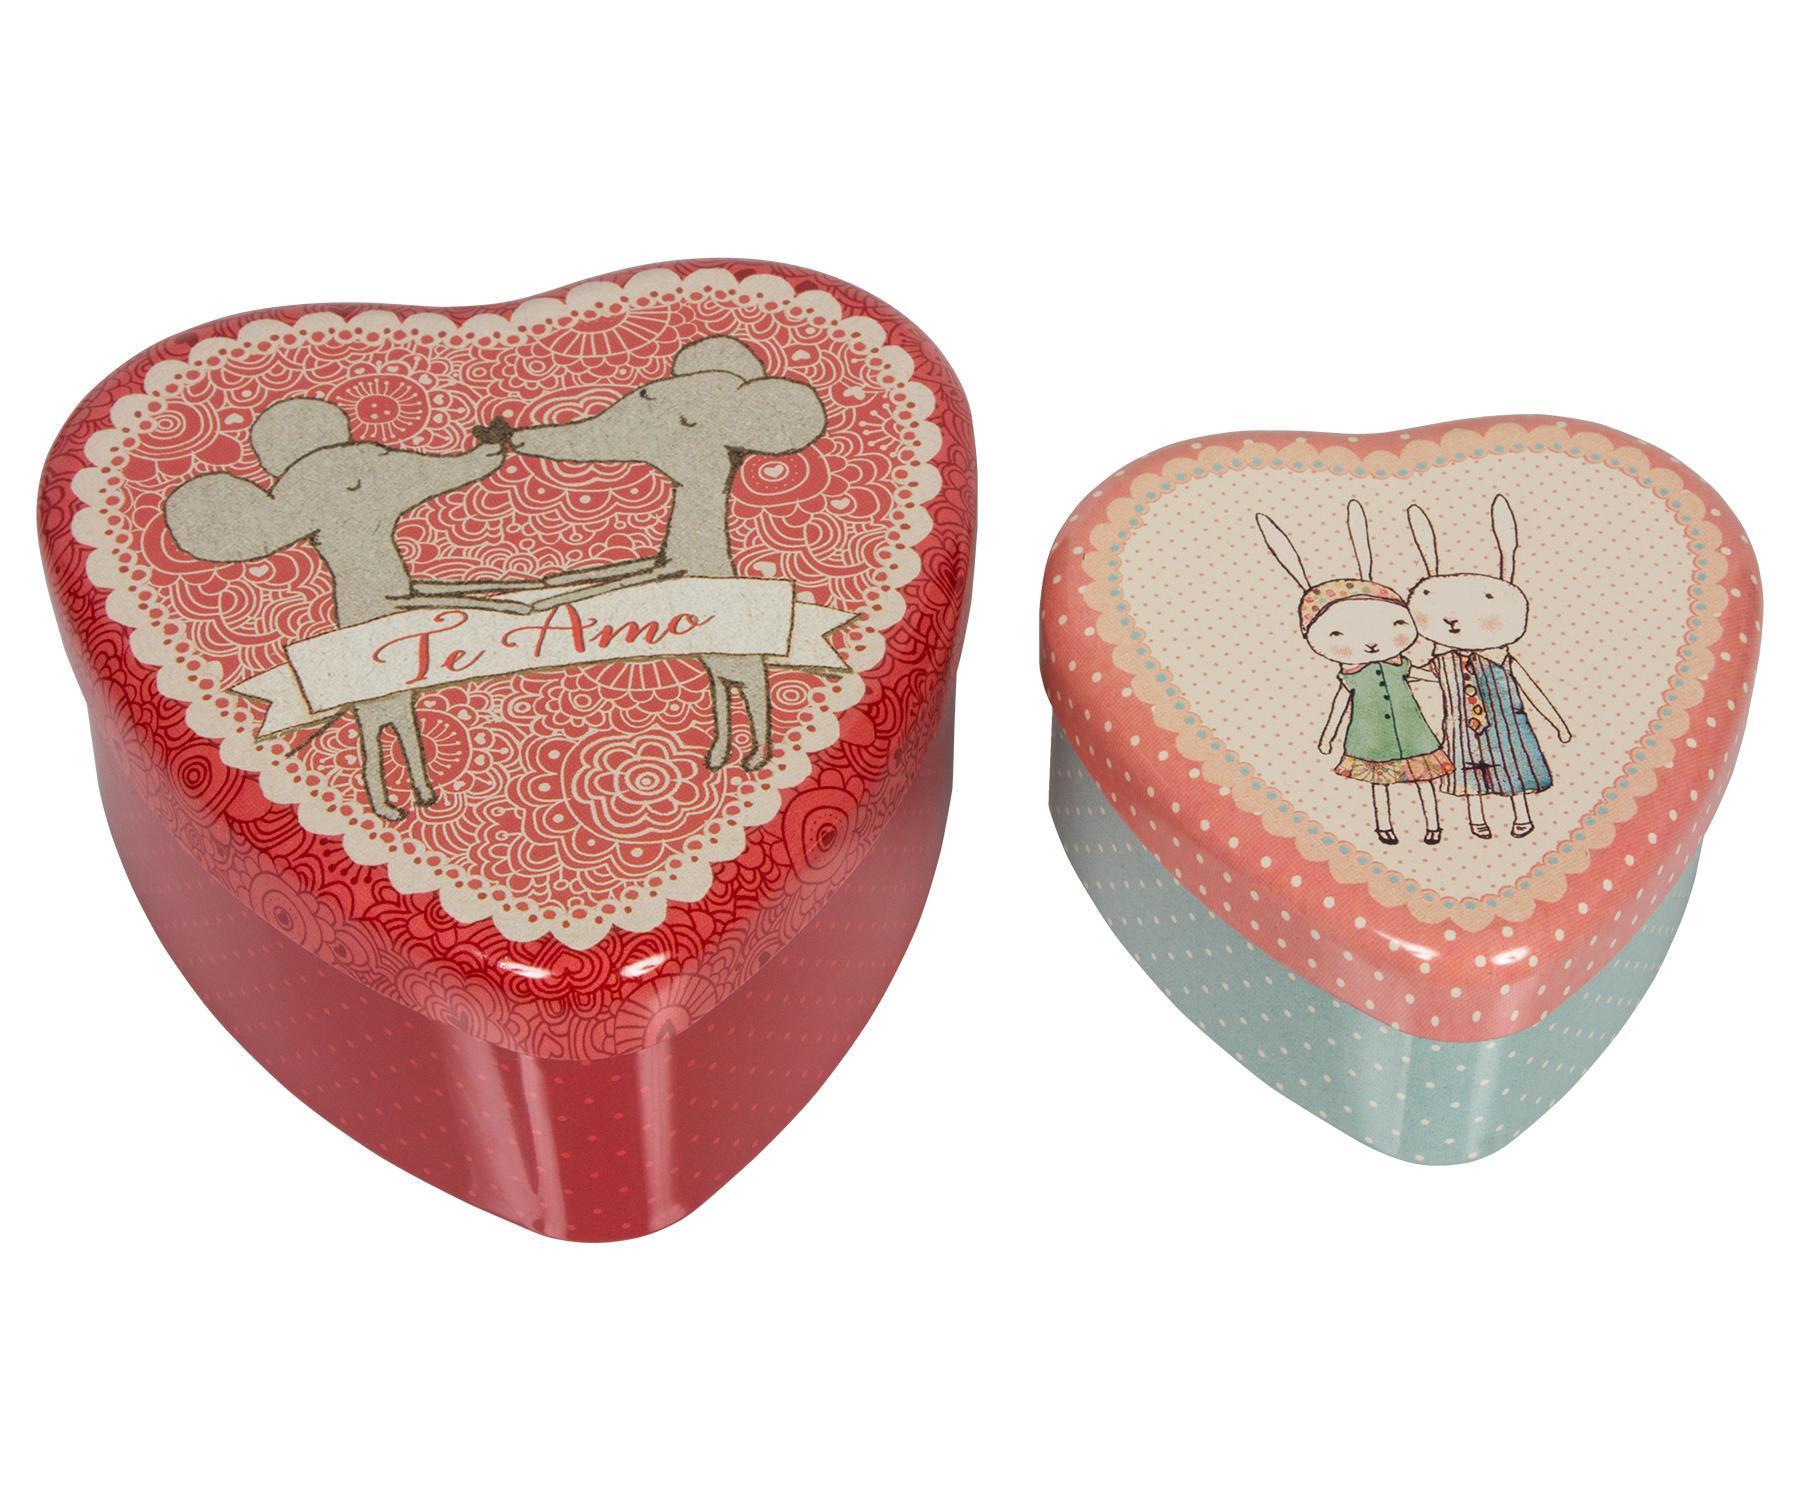 Maileg Plechové krabičky ve tvaru srdce Te amo - set 2 ks, červená barva, multi barva, kov